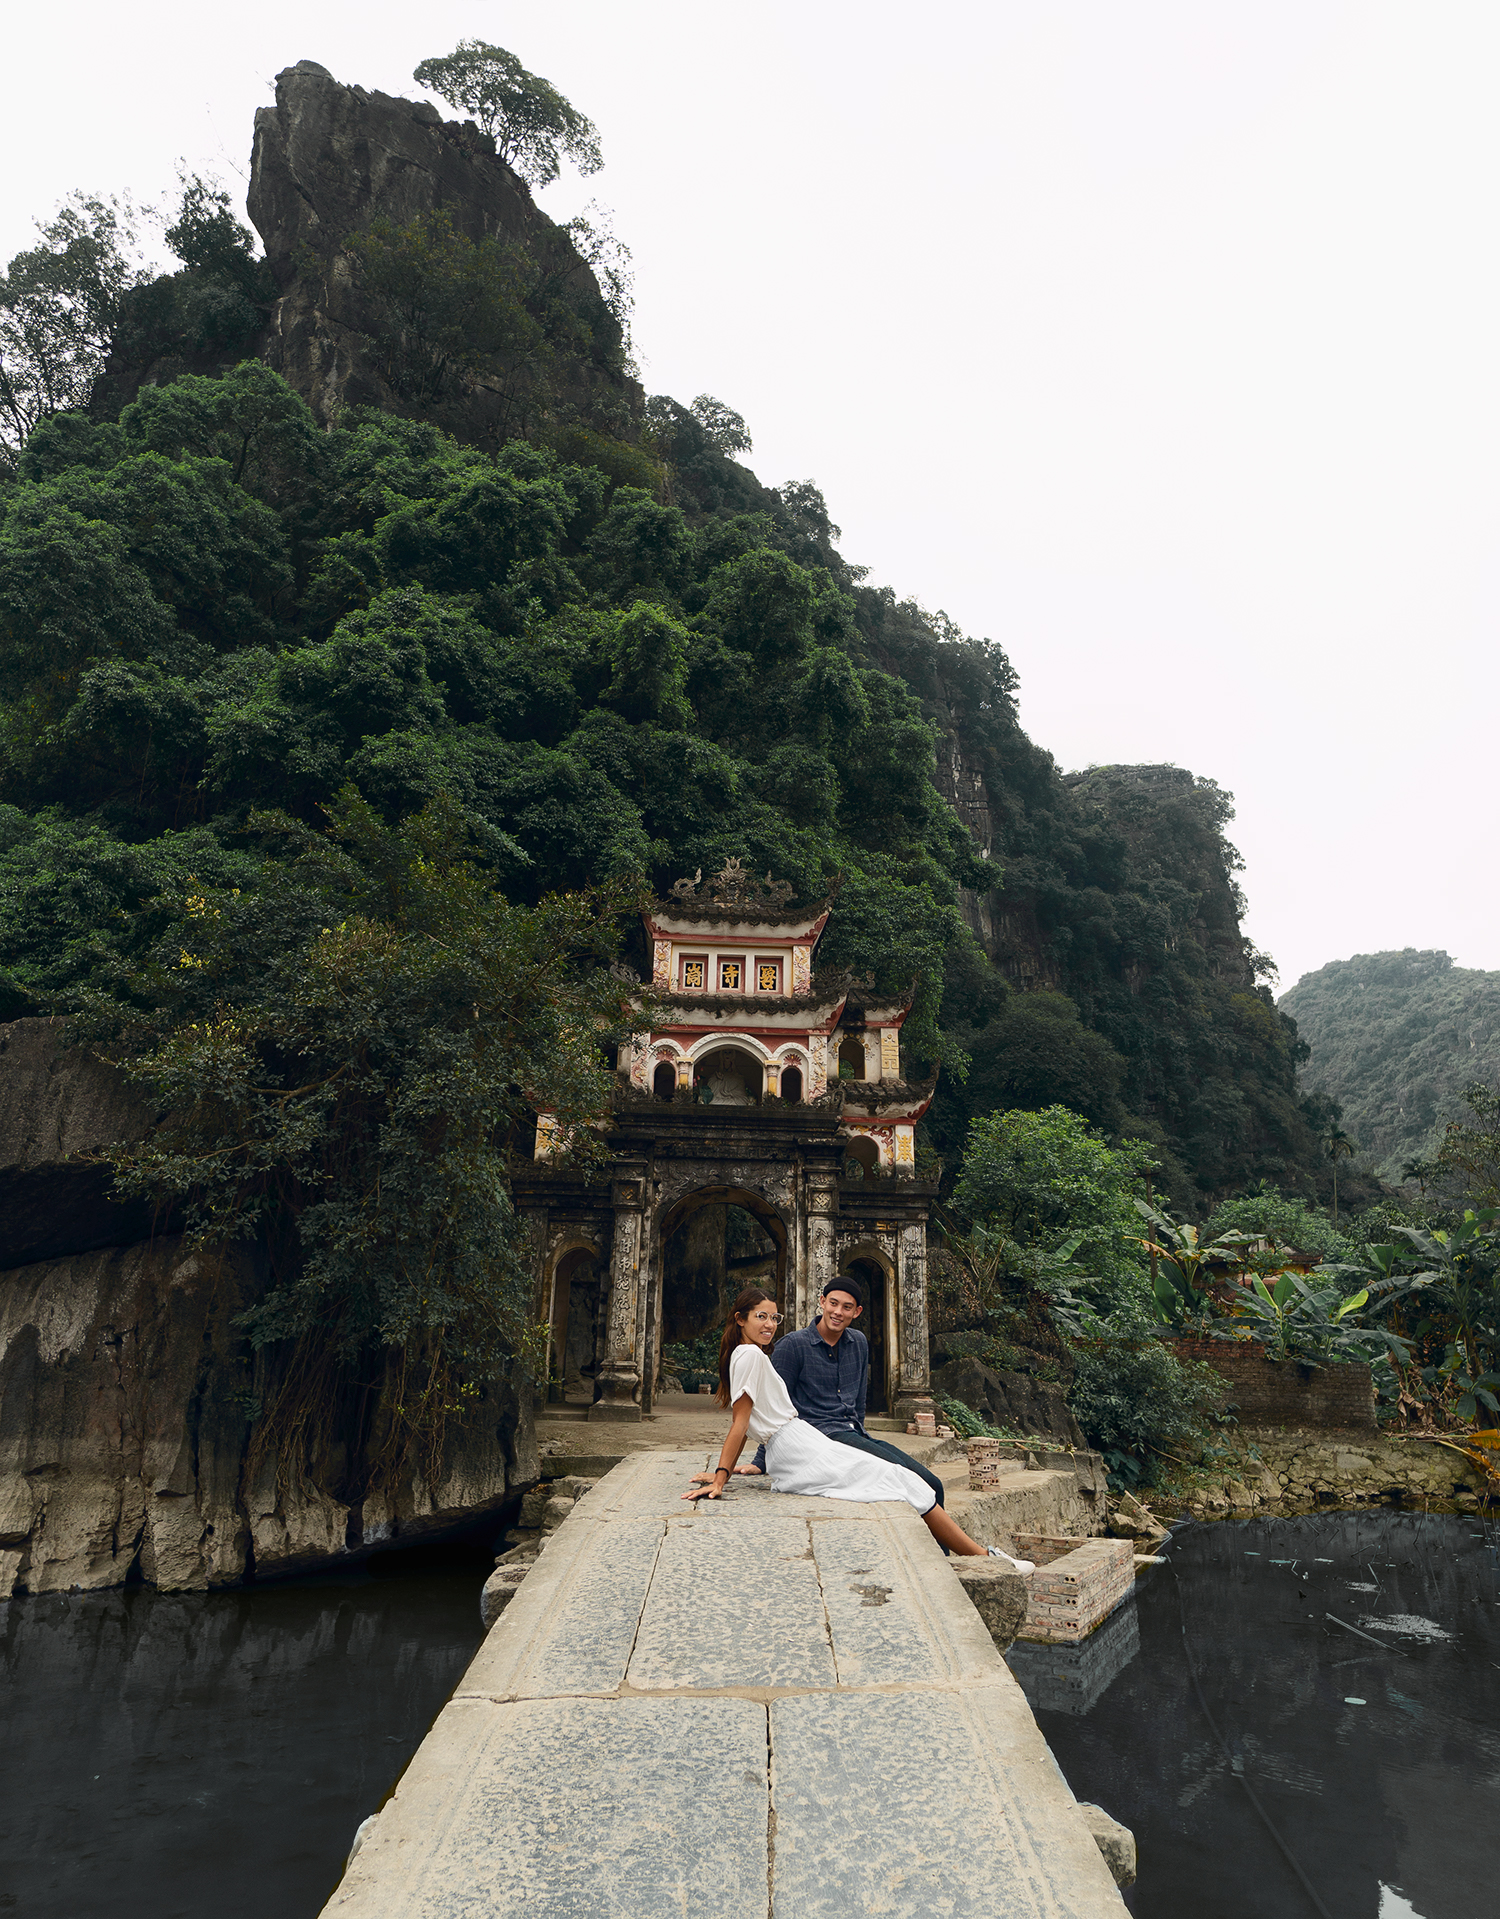 bich_dong_pagoda.jpg